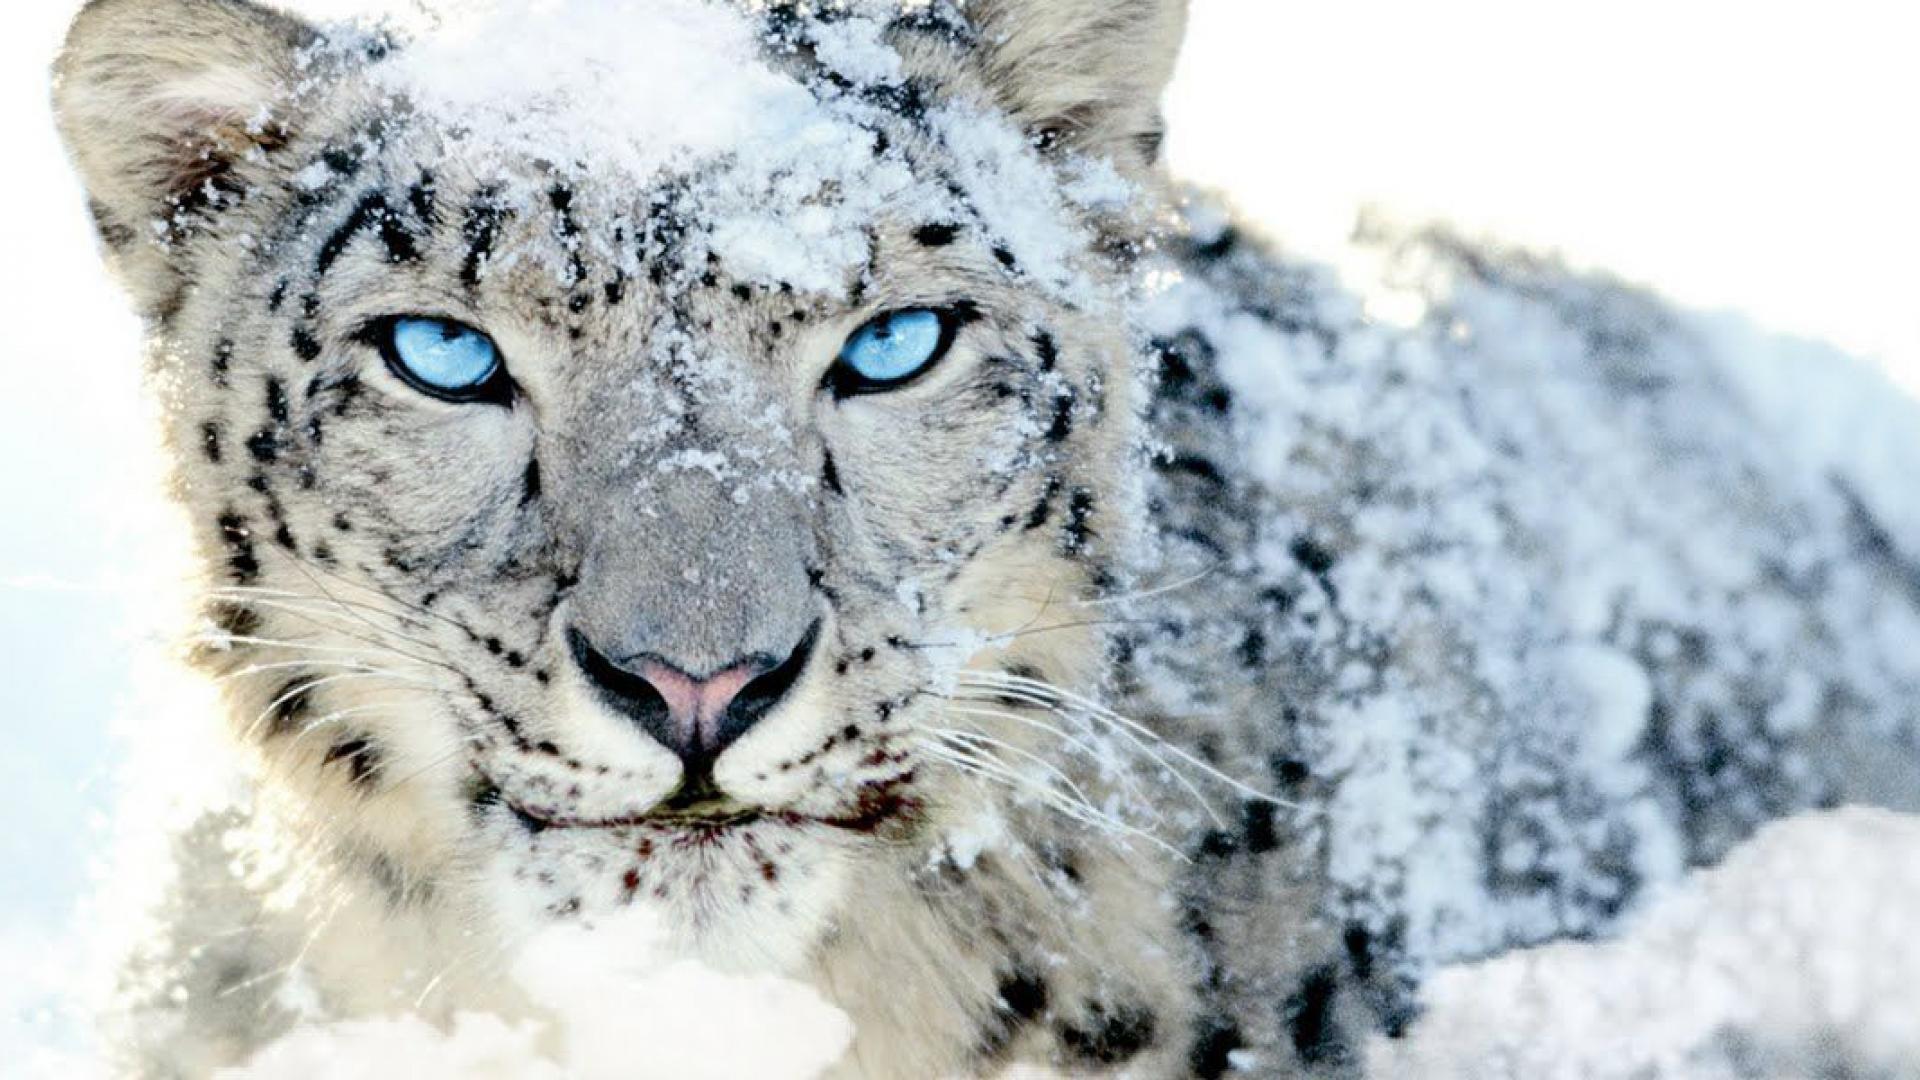 High Resolution Wallpaper | Snow Leopard 1920x1080 px